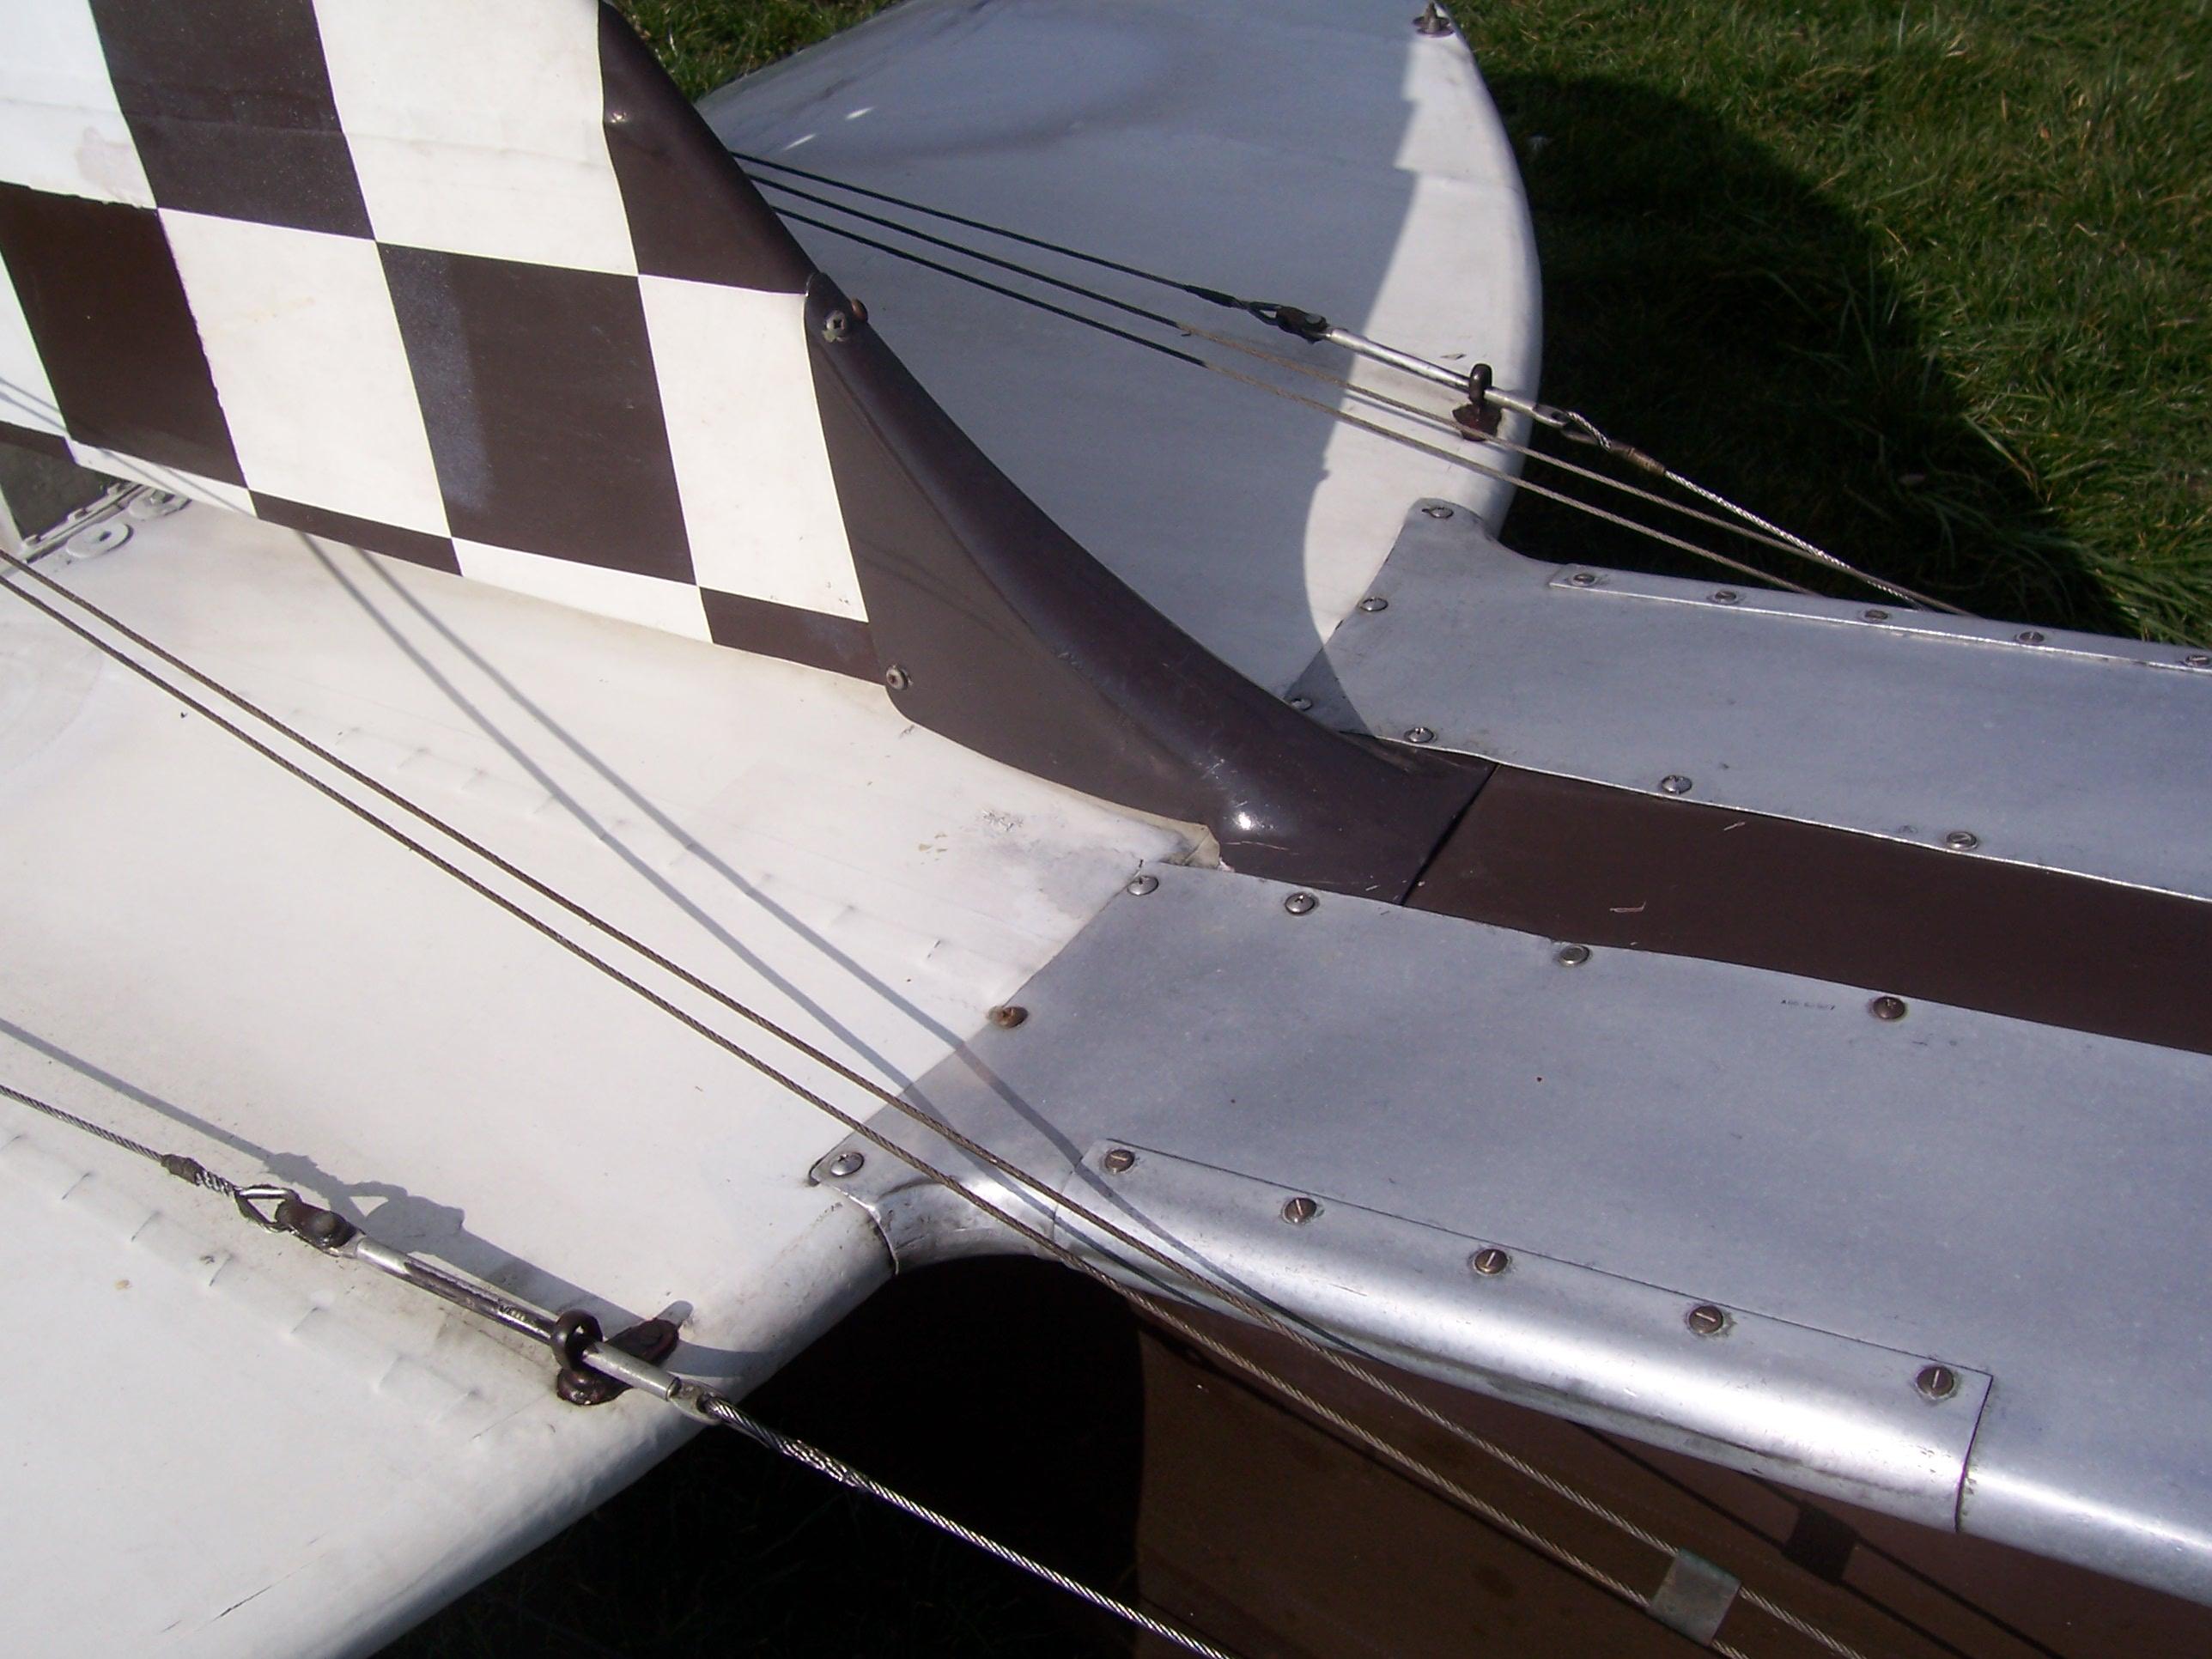 Flight Control Cables : Wiki aircraft flight control system upcscavenger